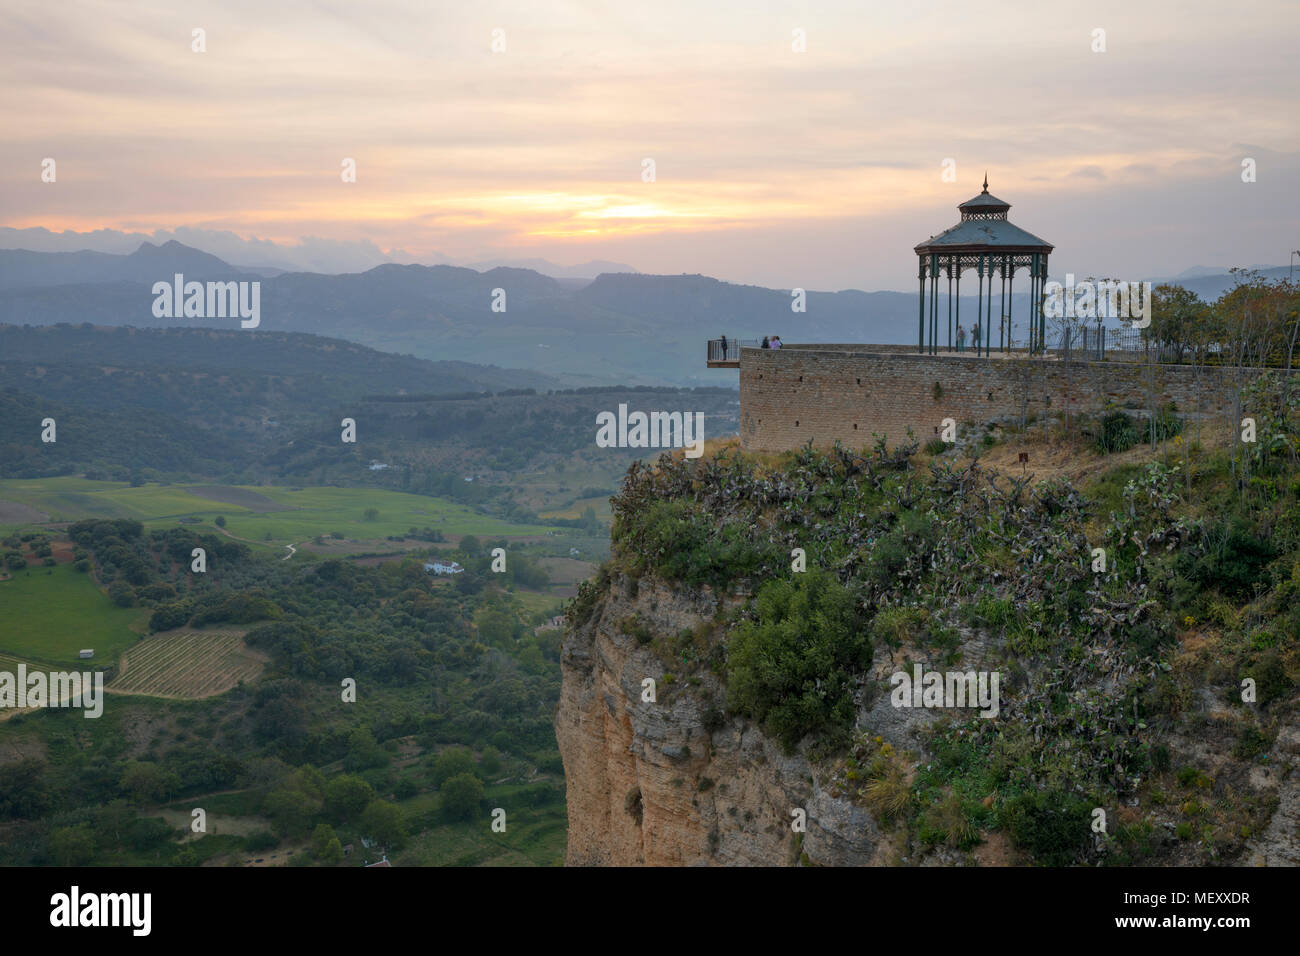 Mirador de Ronda at sunset with view over the mountains of Sierra de Grazalema, Ronda, Andalucia, Spain, Europe Stock Photo